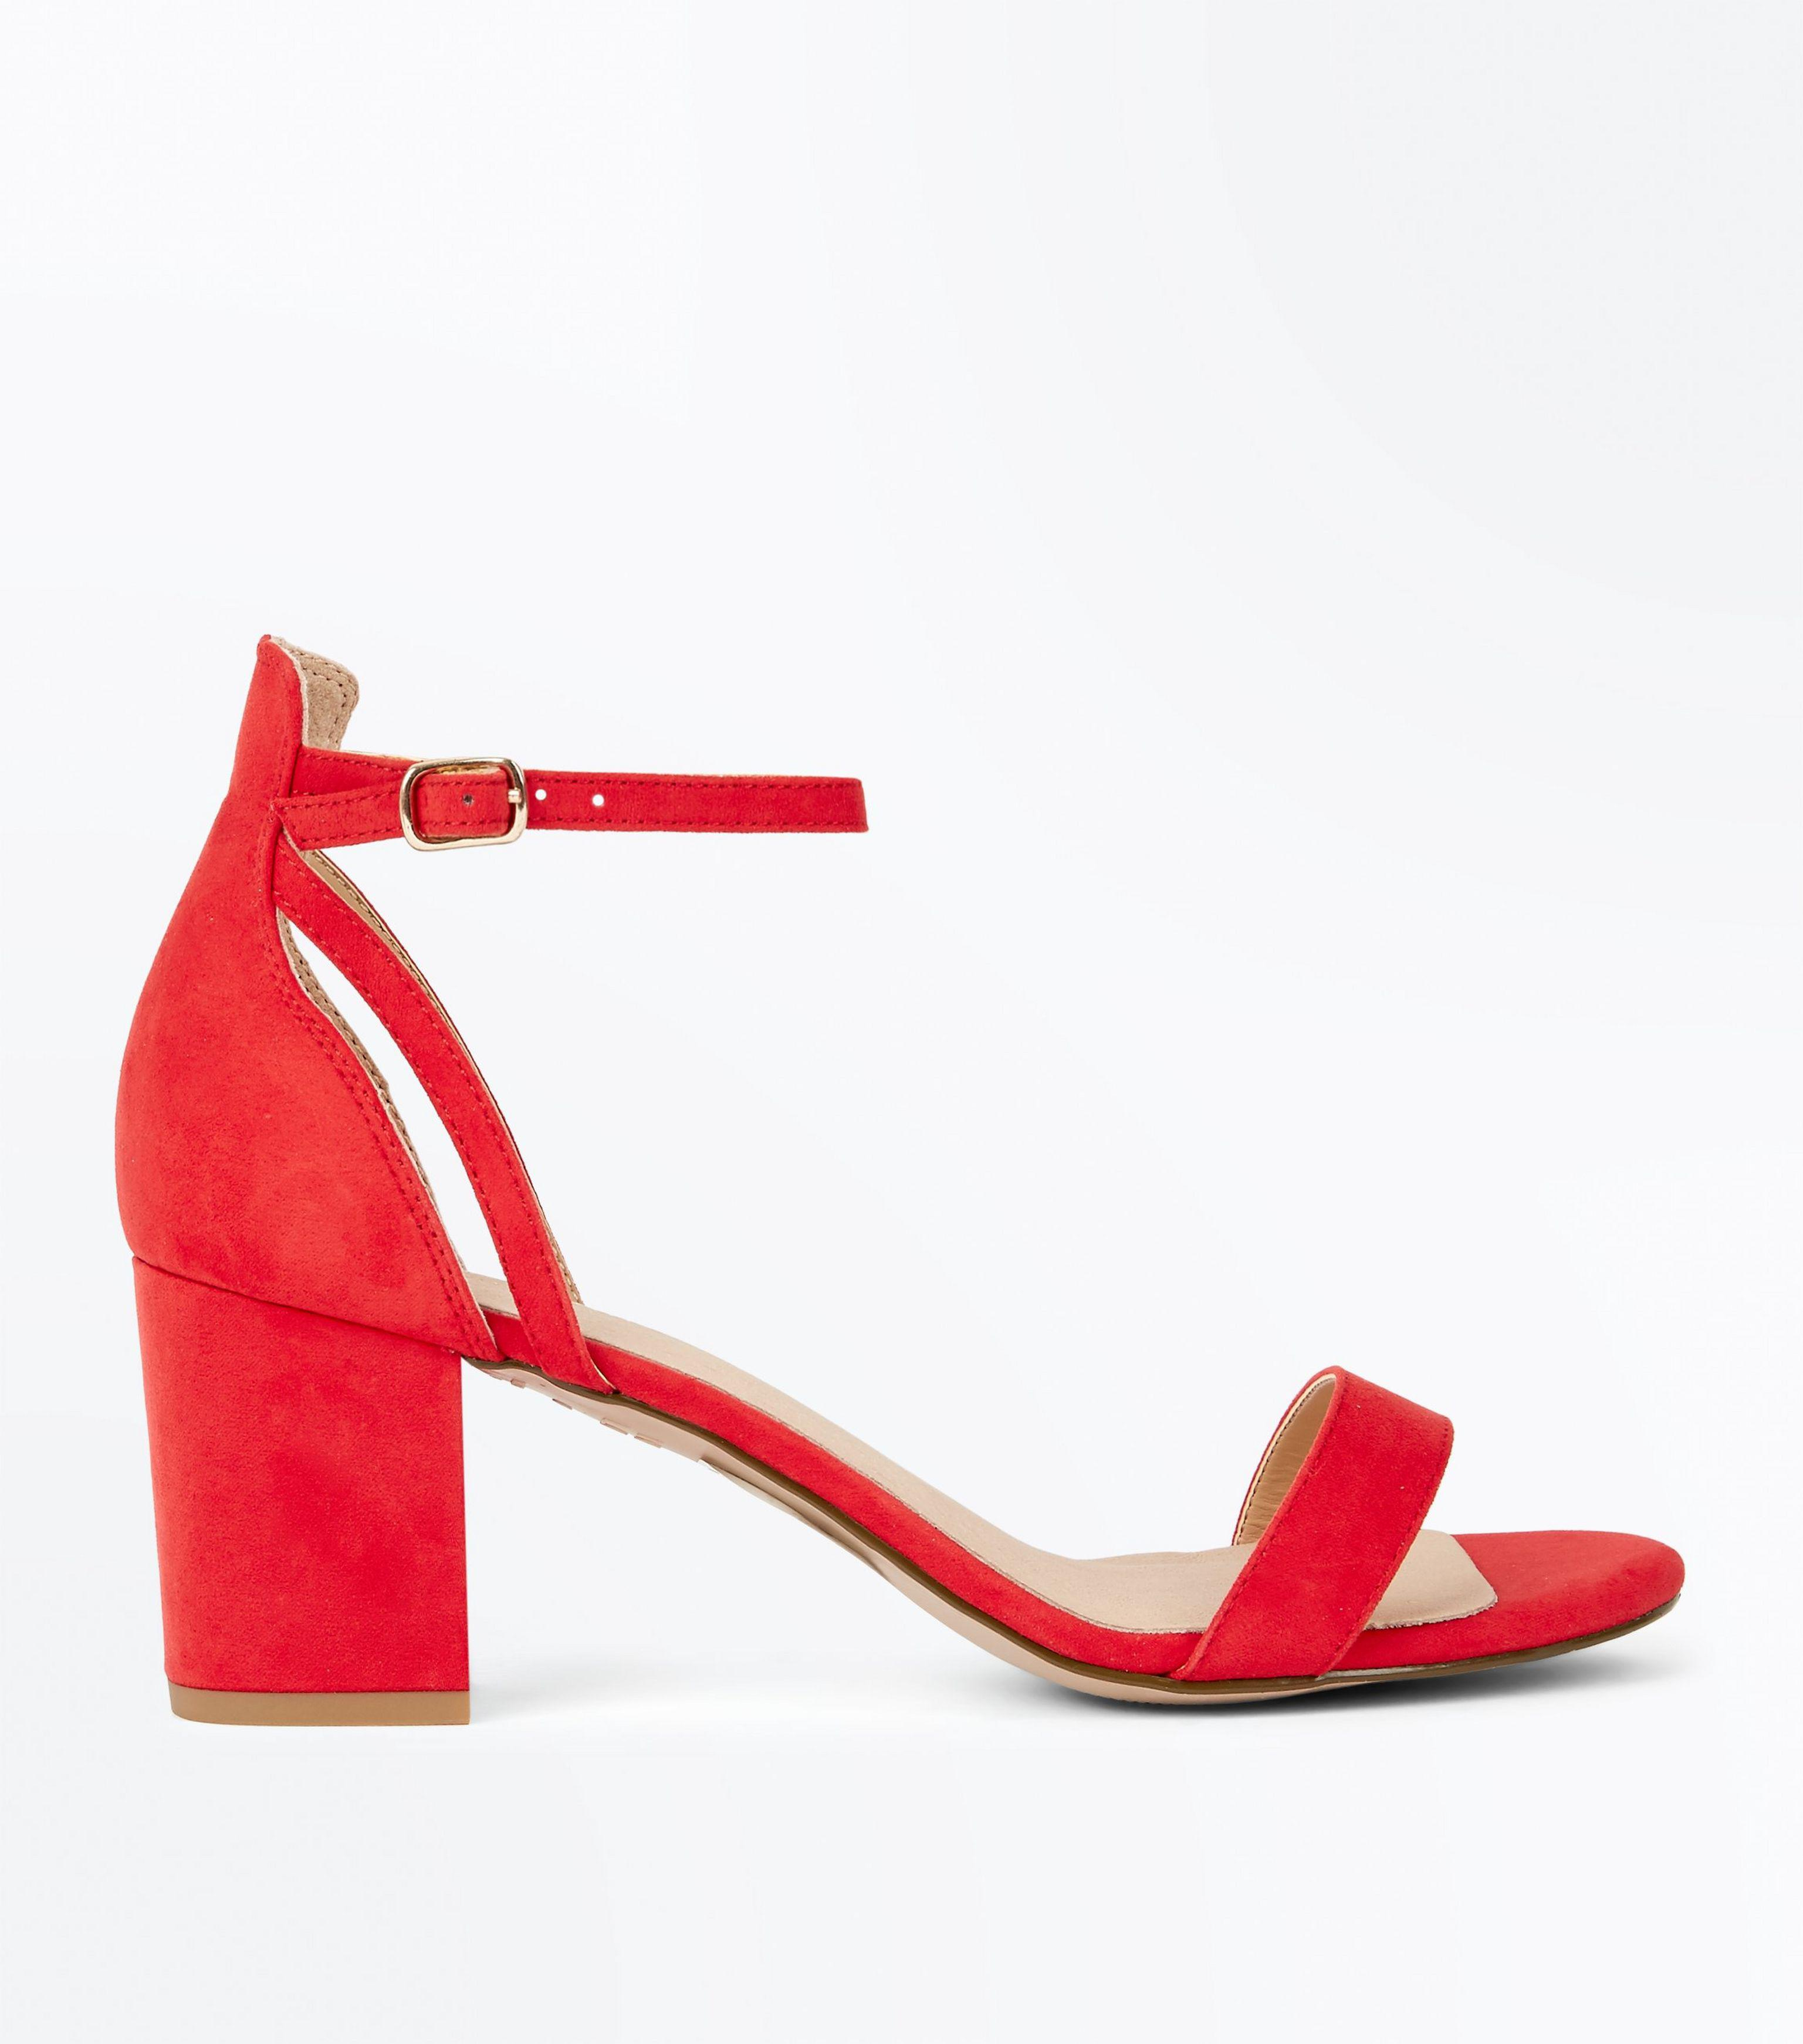 984171a568cc New Look Red Comfort Flex Suedette Block Heel Sandals in Red - Lyst